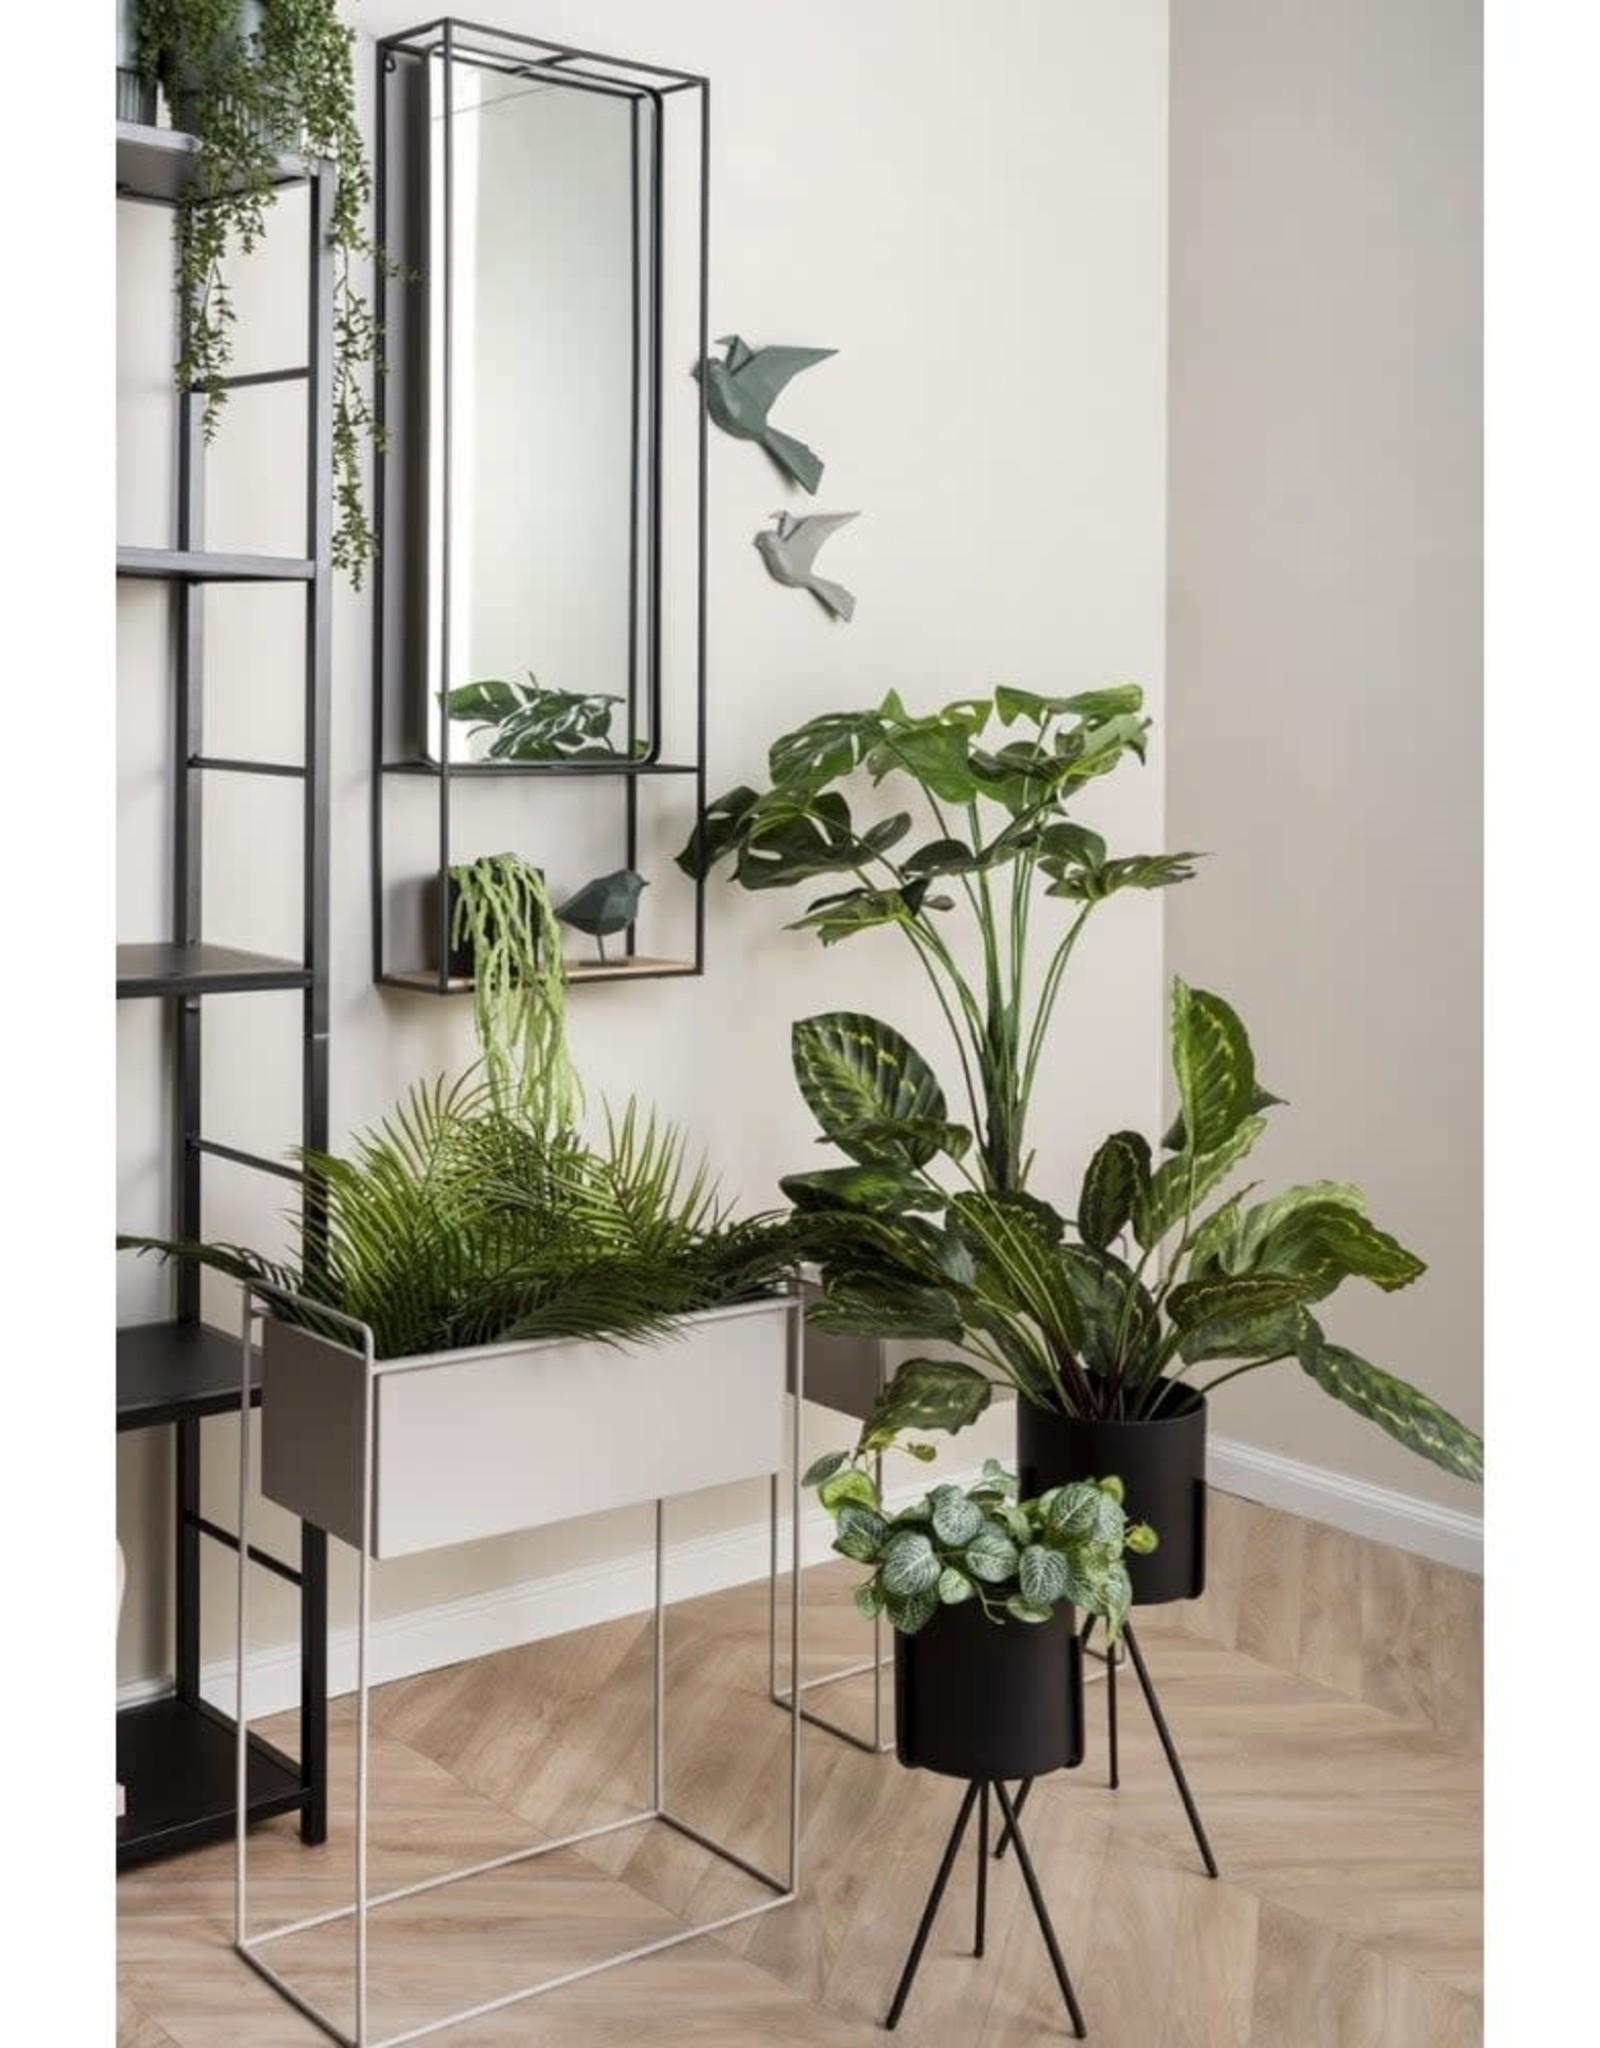 pt Iron planter on stand L [straight] 51 x 24 x 65cm - Warm grey